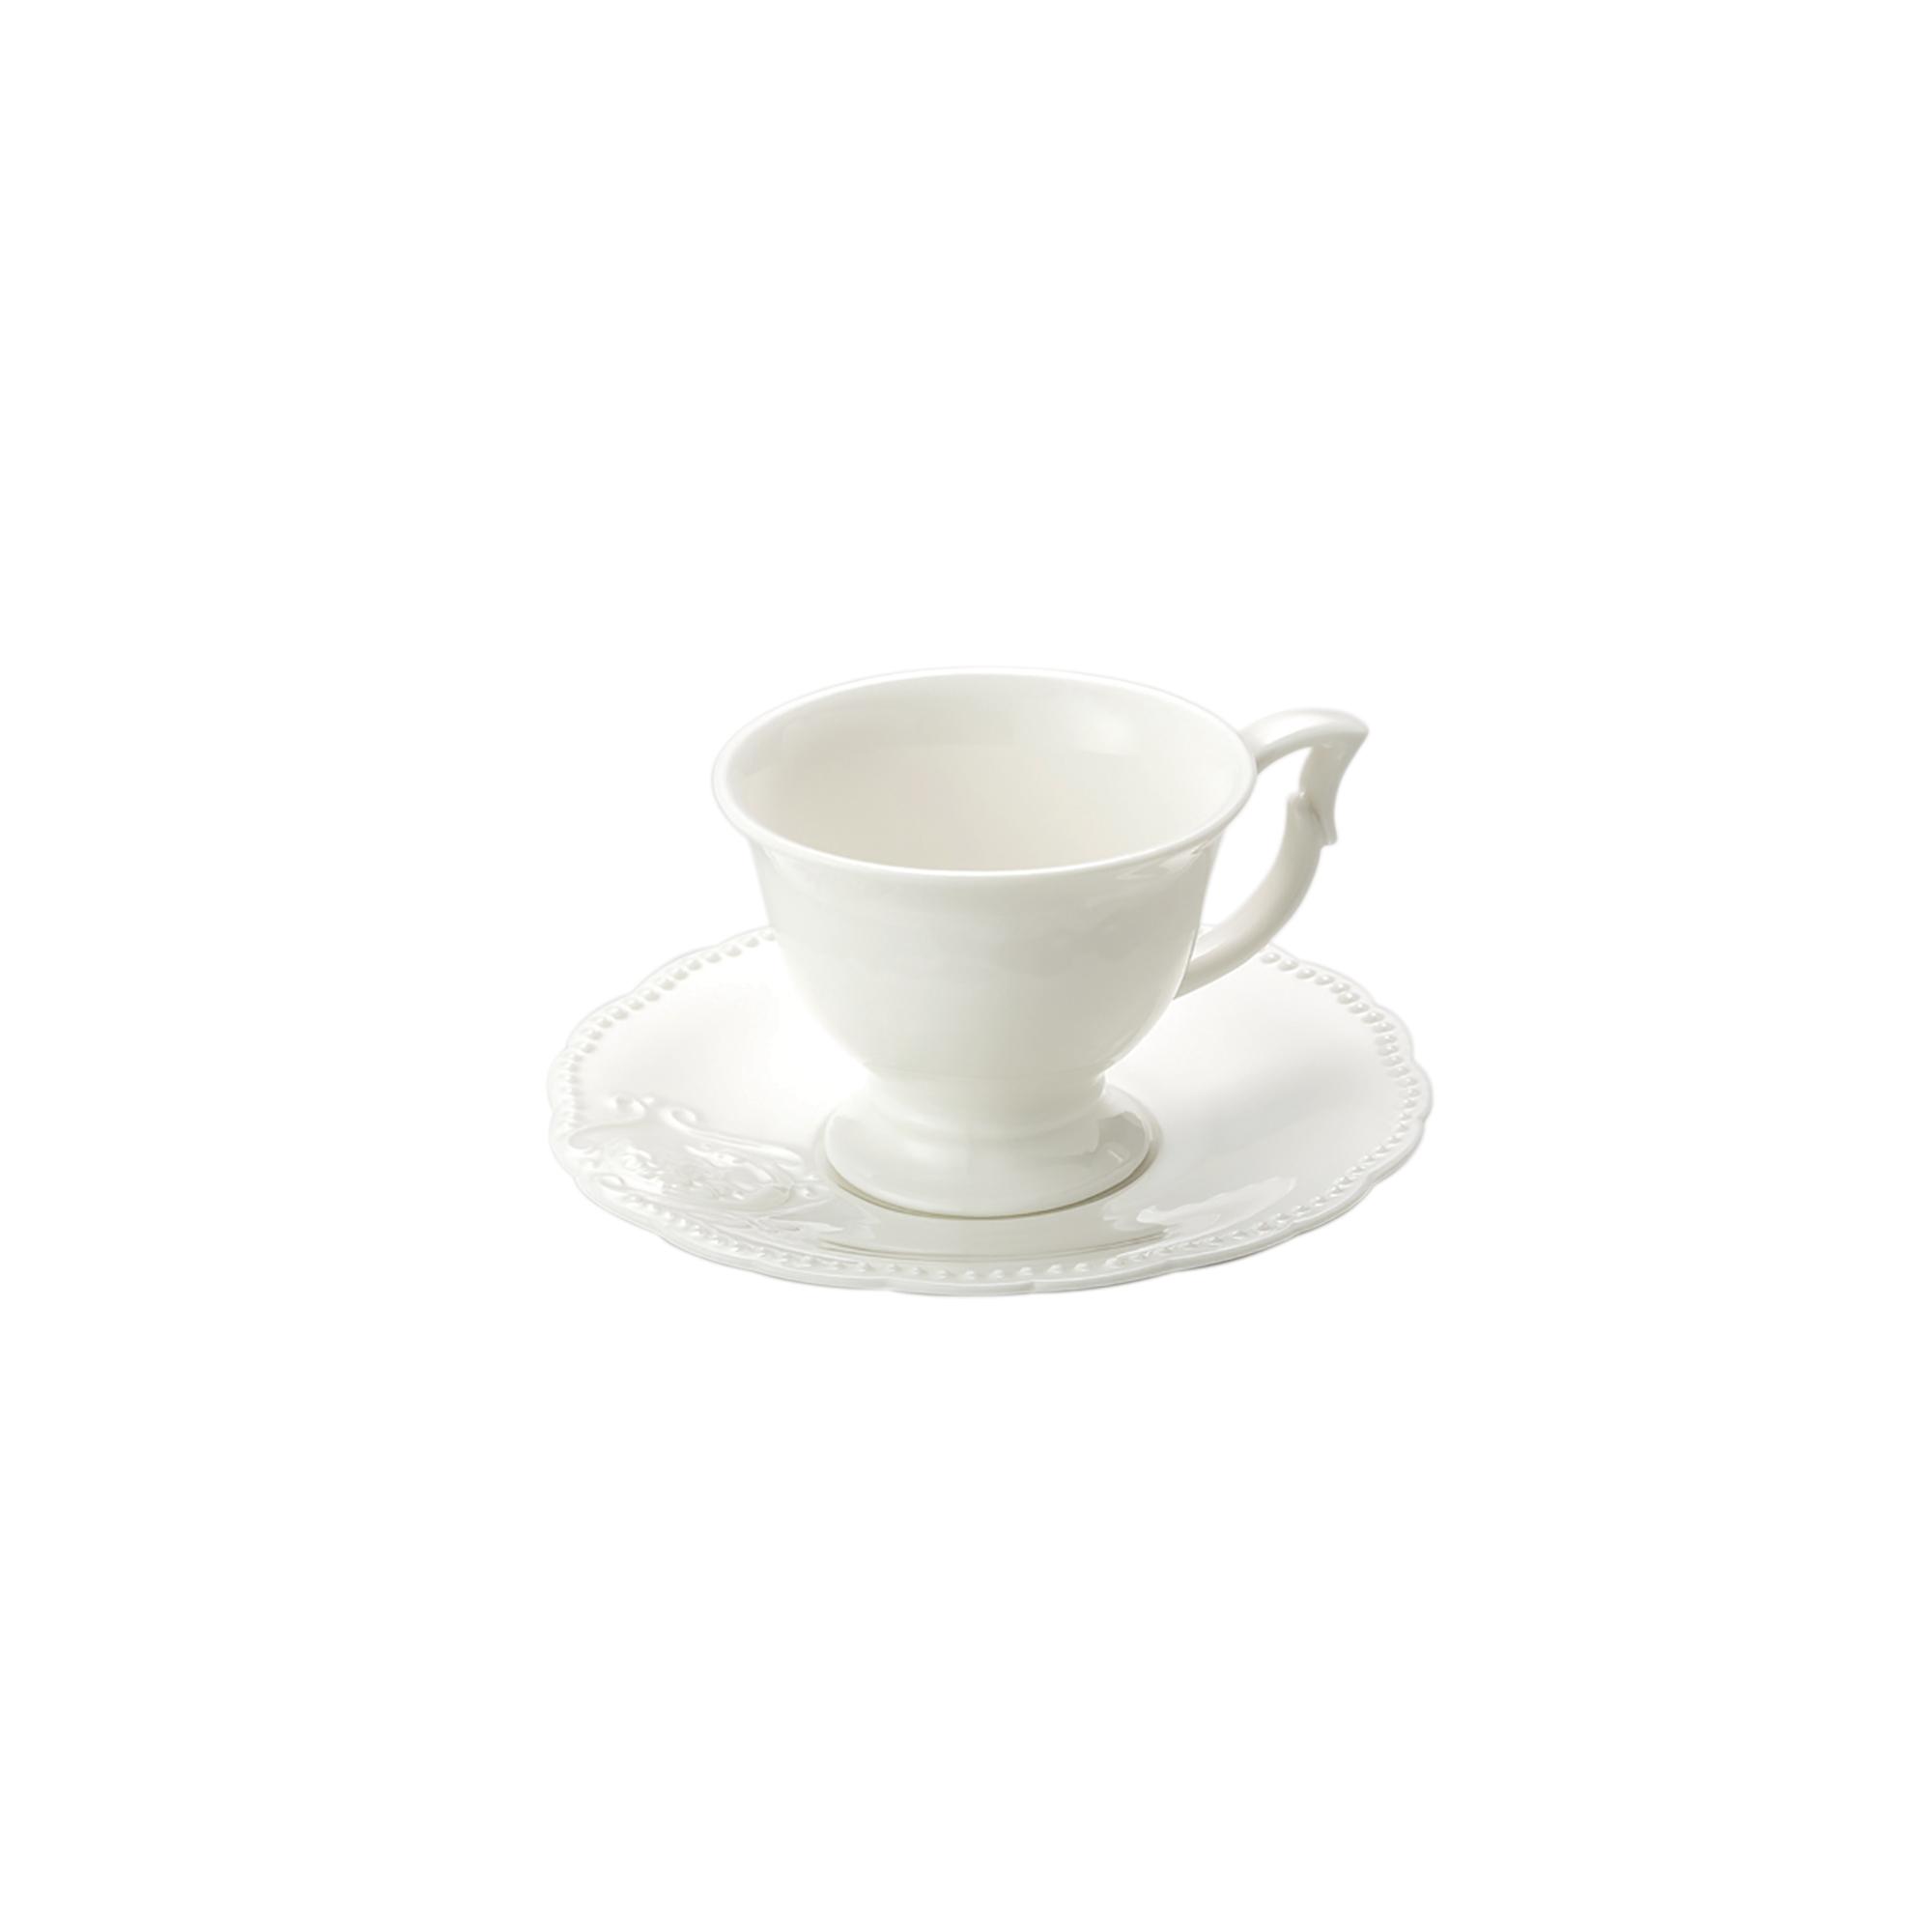 Jogo 4 Xícaras p/Café c/Pires de Porcelana Branco 100ml Lyor  - Lemis